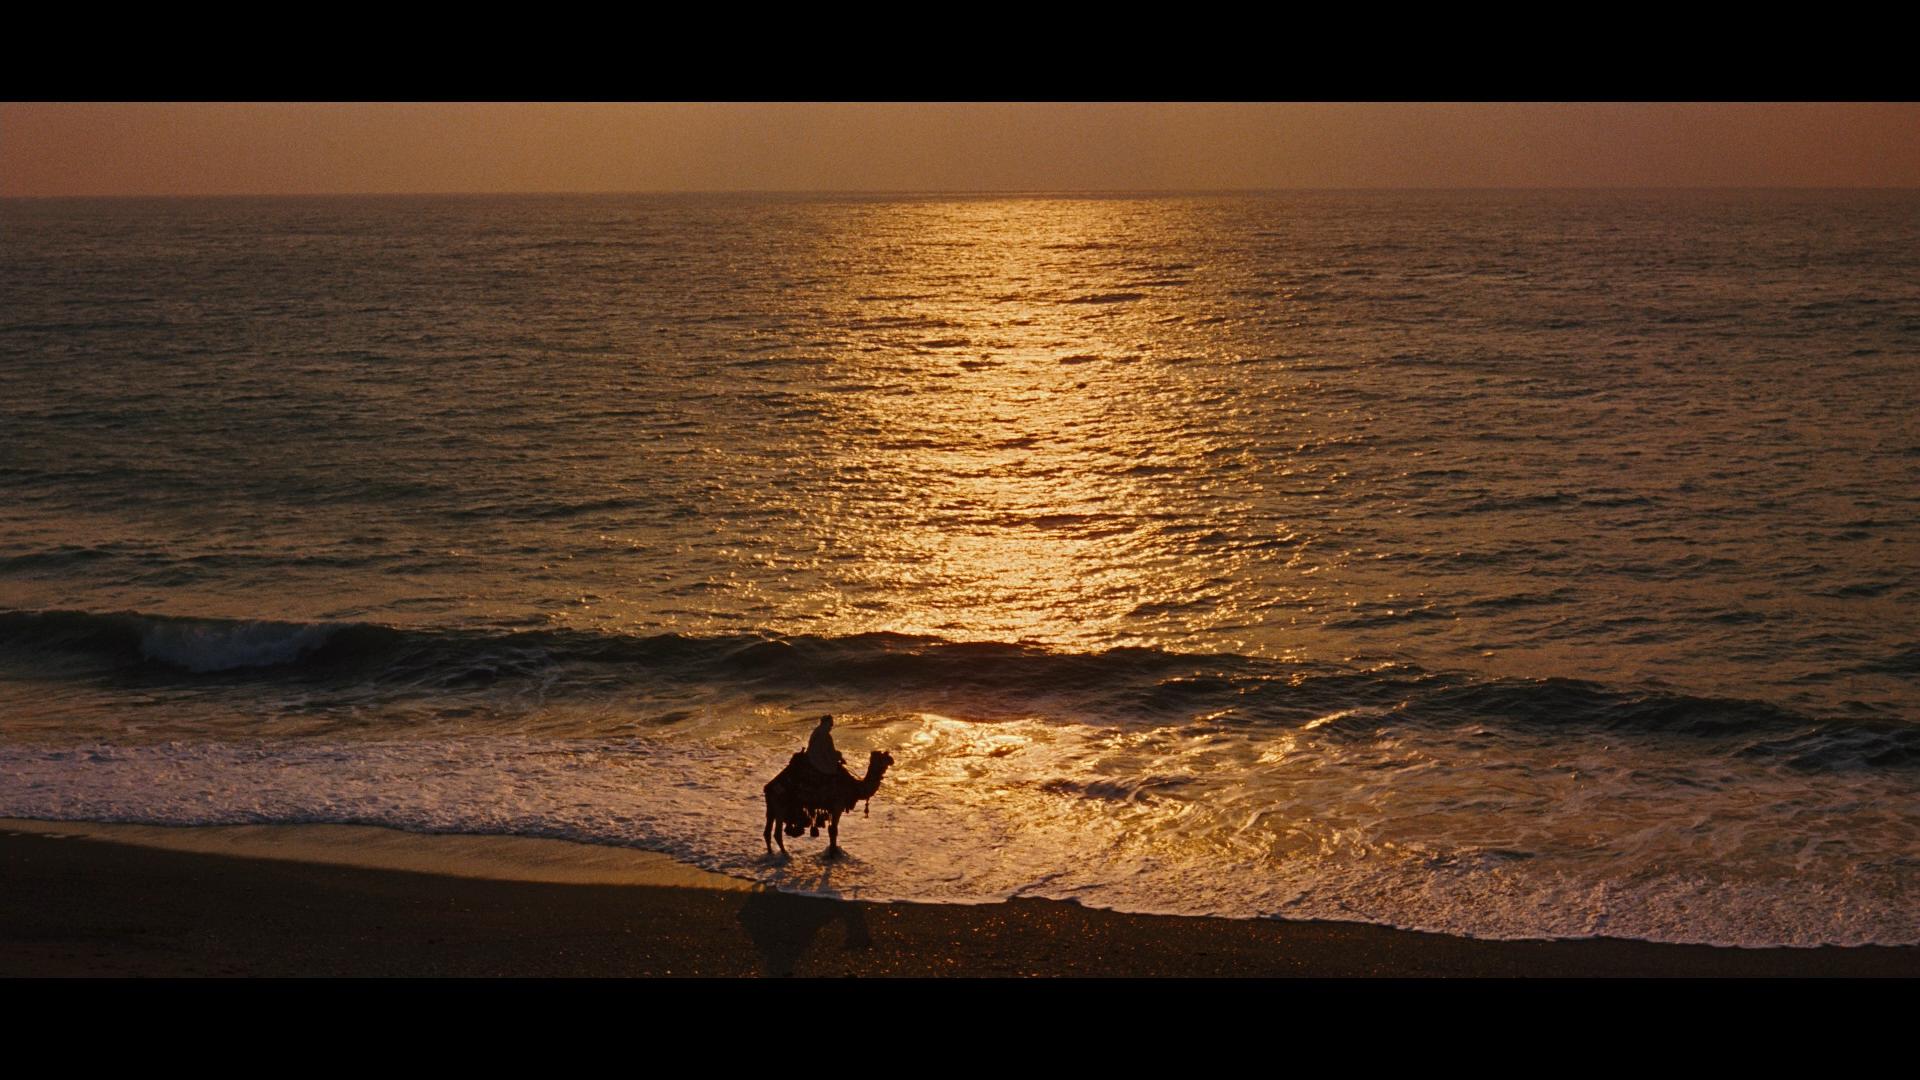 Lawrence of Arabia [1920x1080] Beautiful Wallpaper Pinterest 1920x1080